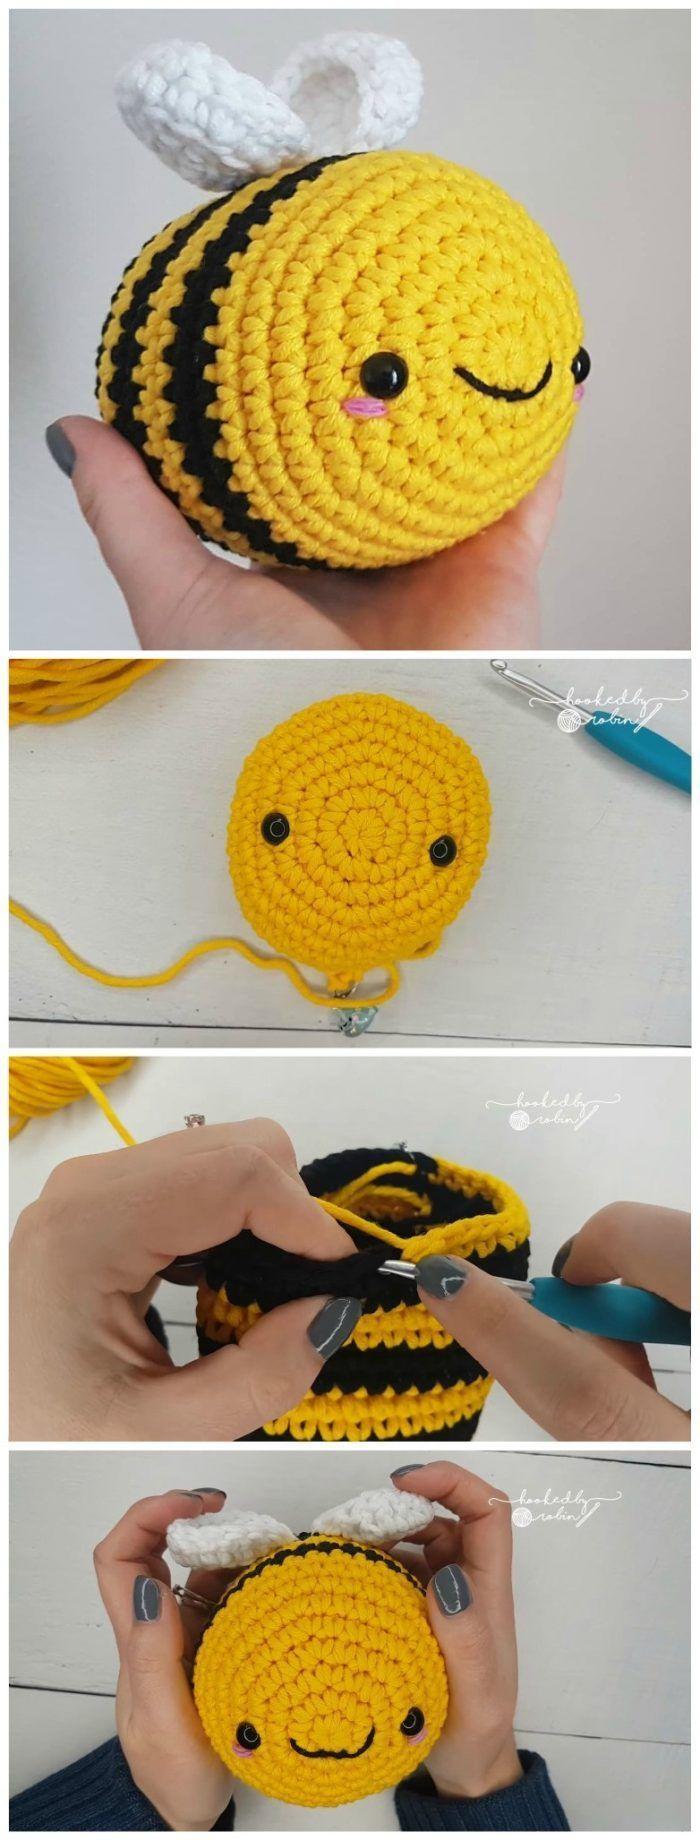 Amigurumi Bumblebee Free Crochet Pattern - Harmony  Amigurumi Bumblebee Free Crochet Pattern – #amigurumi #Bumblebee #Crochet #Free #pattern  #Amigurumi #Bumblebee #Crochet #Free #Harmony #Pattern